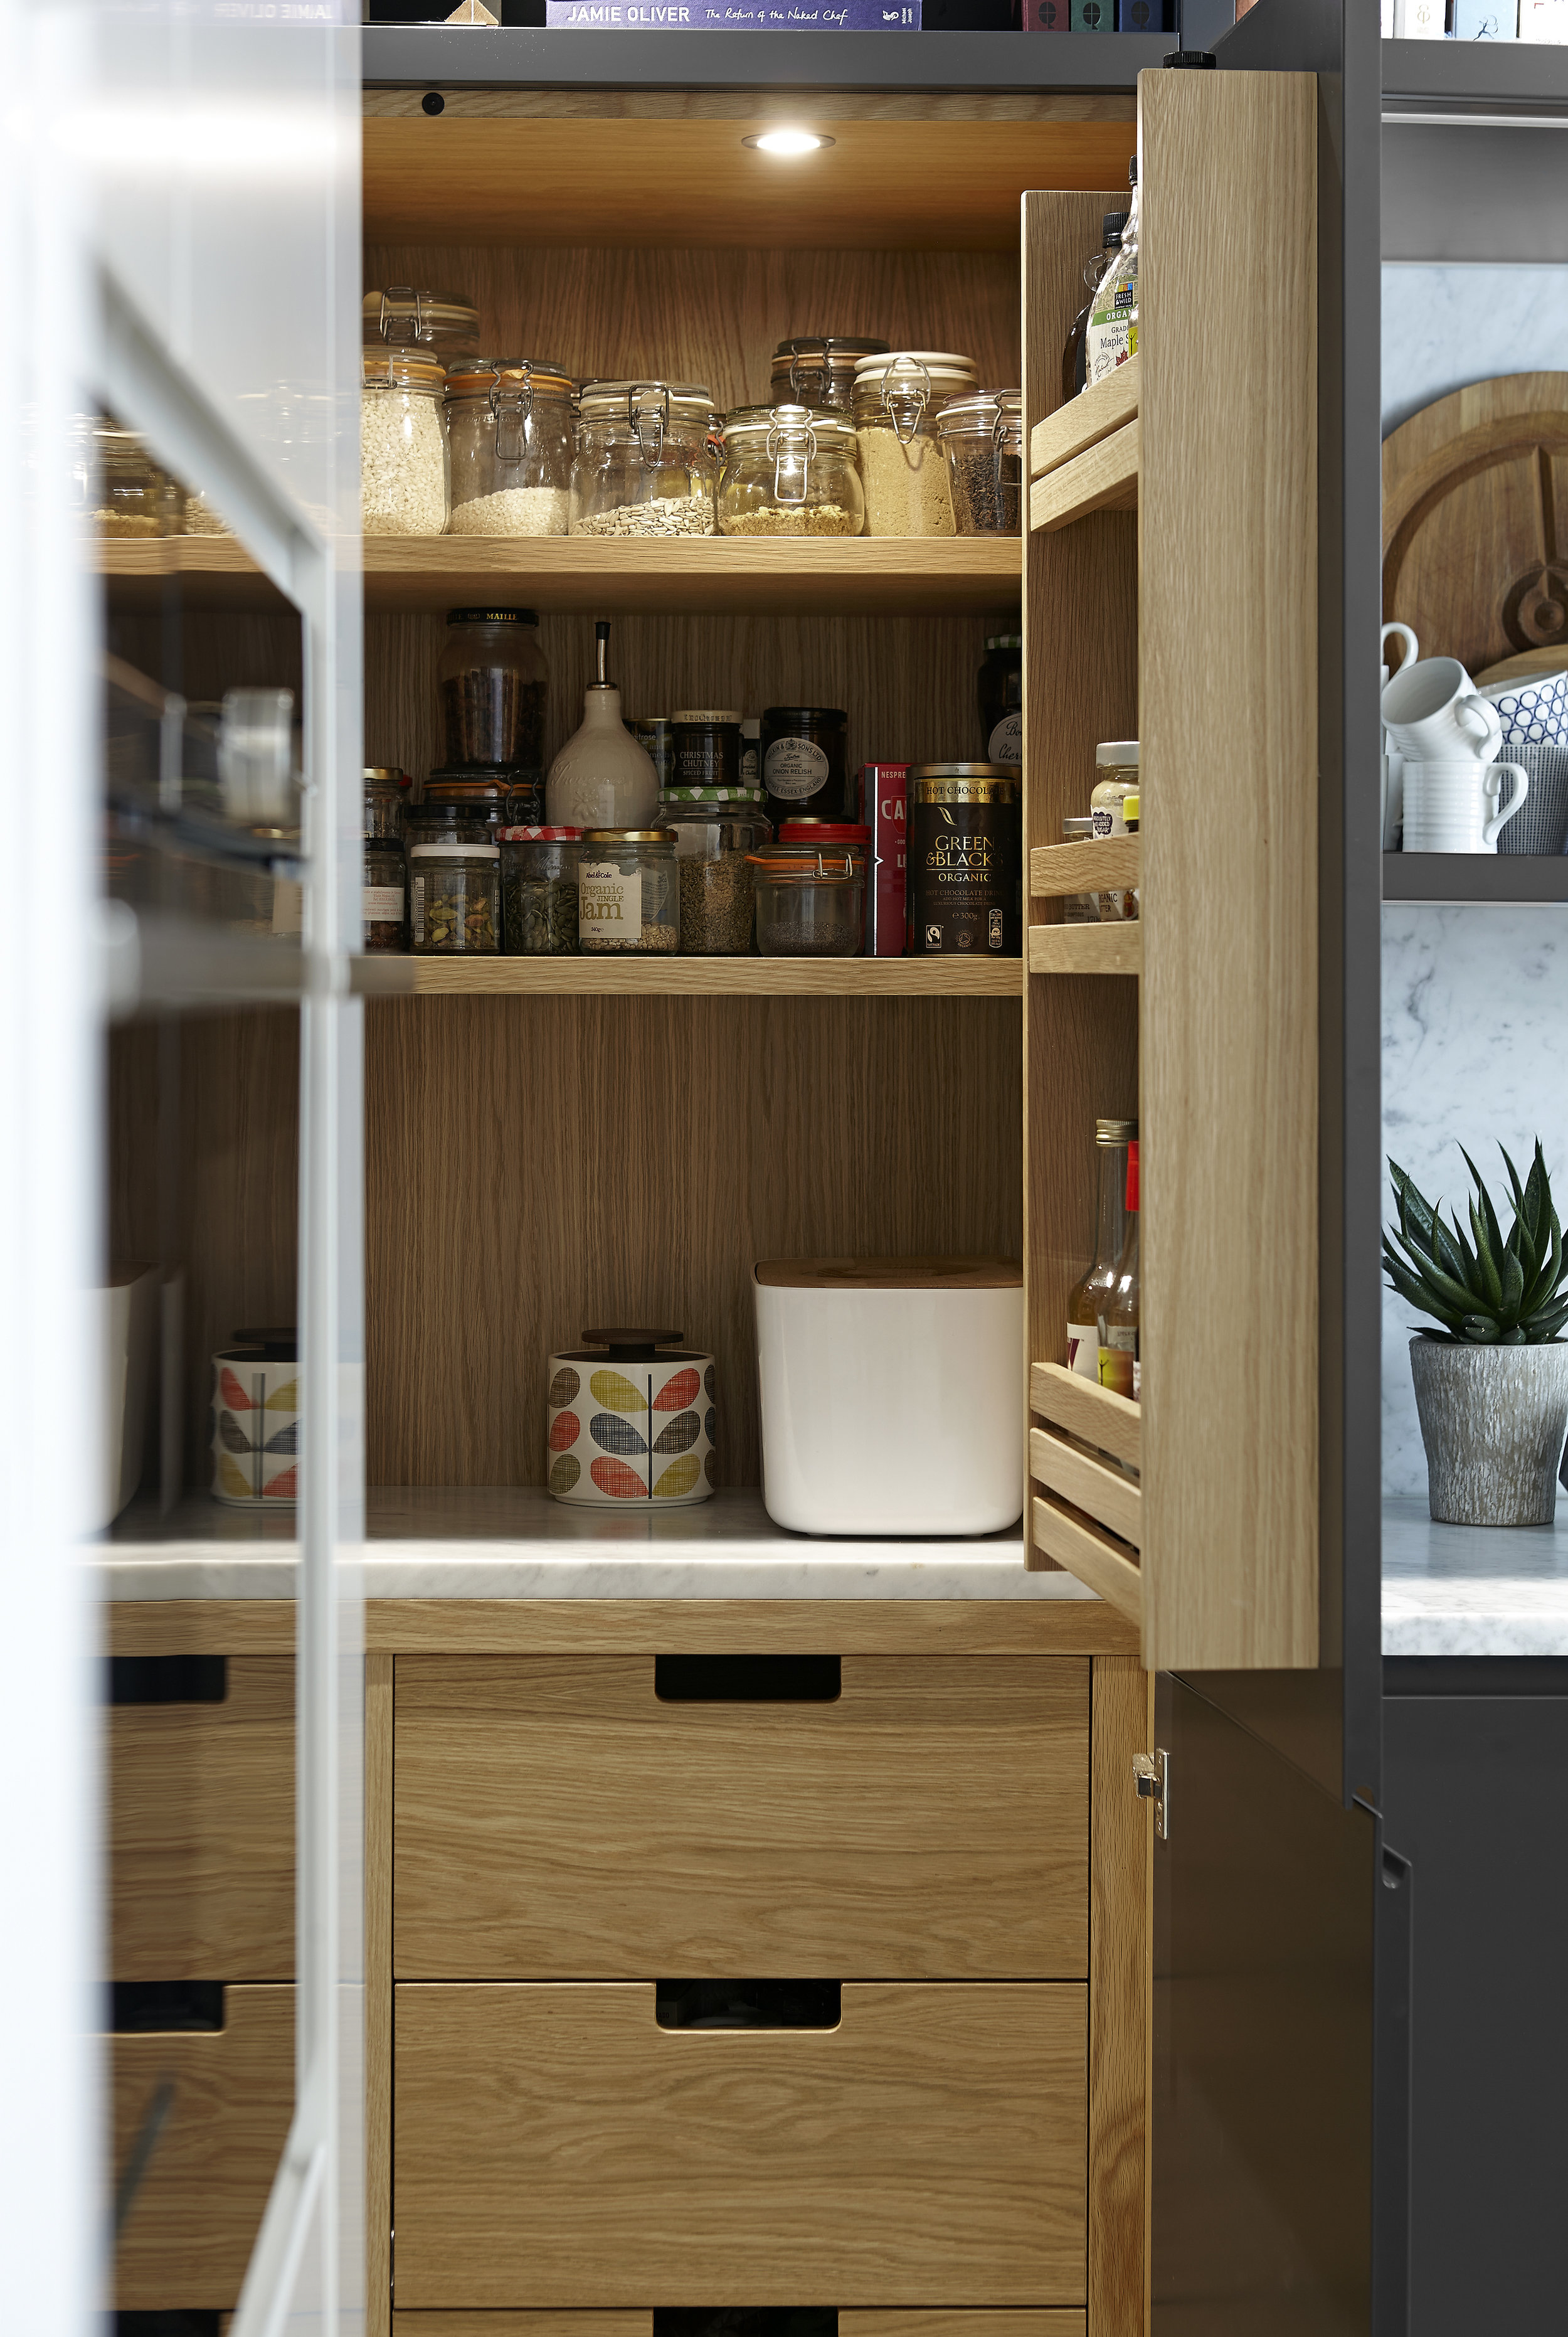 kitchens1141 1.jpg